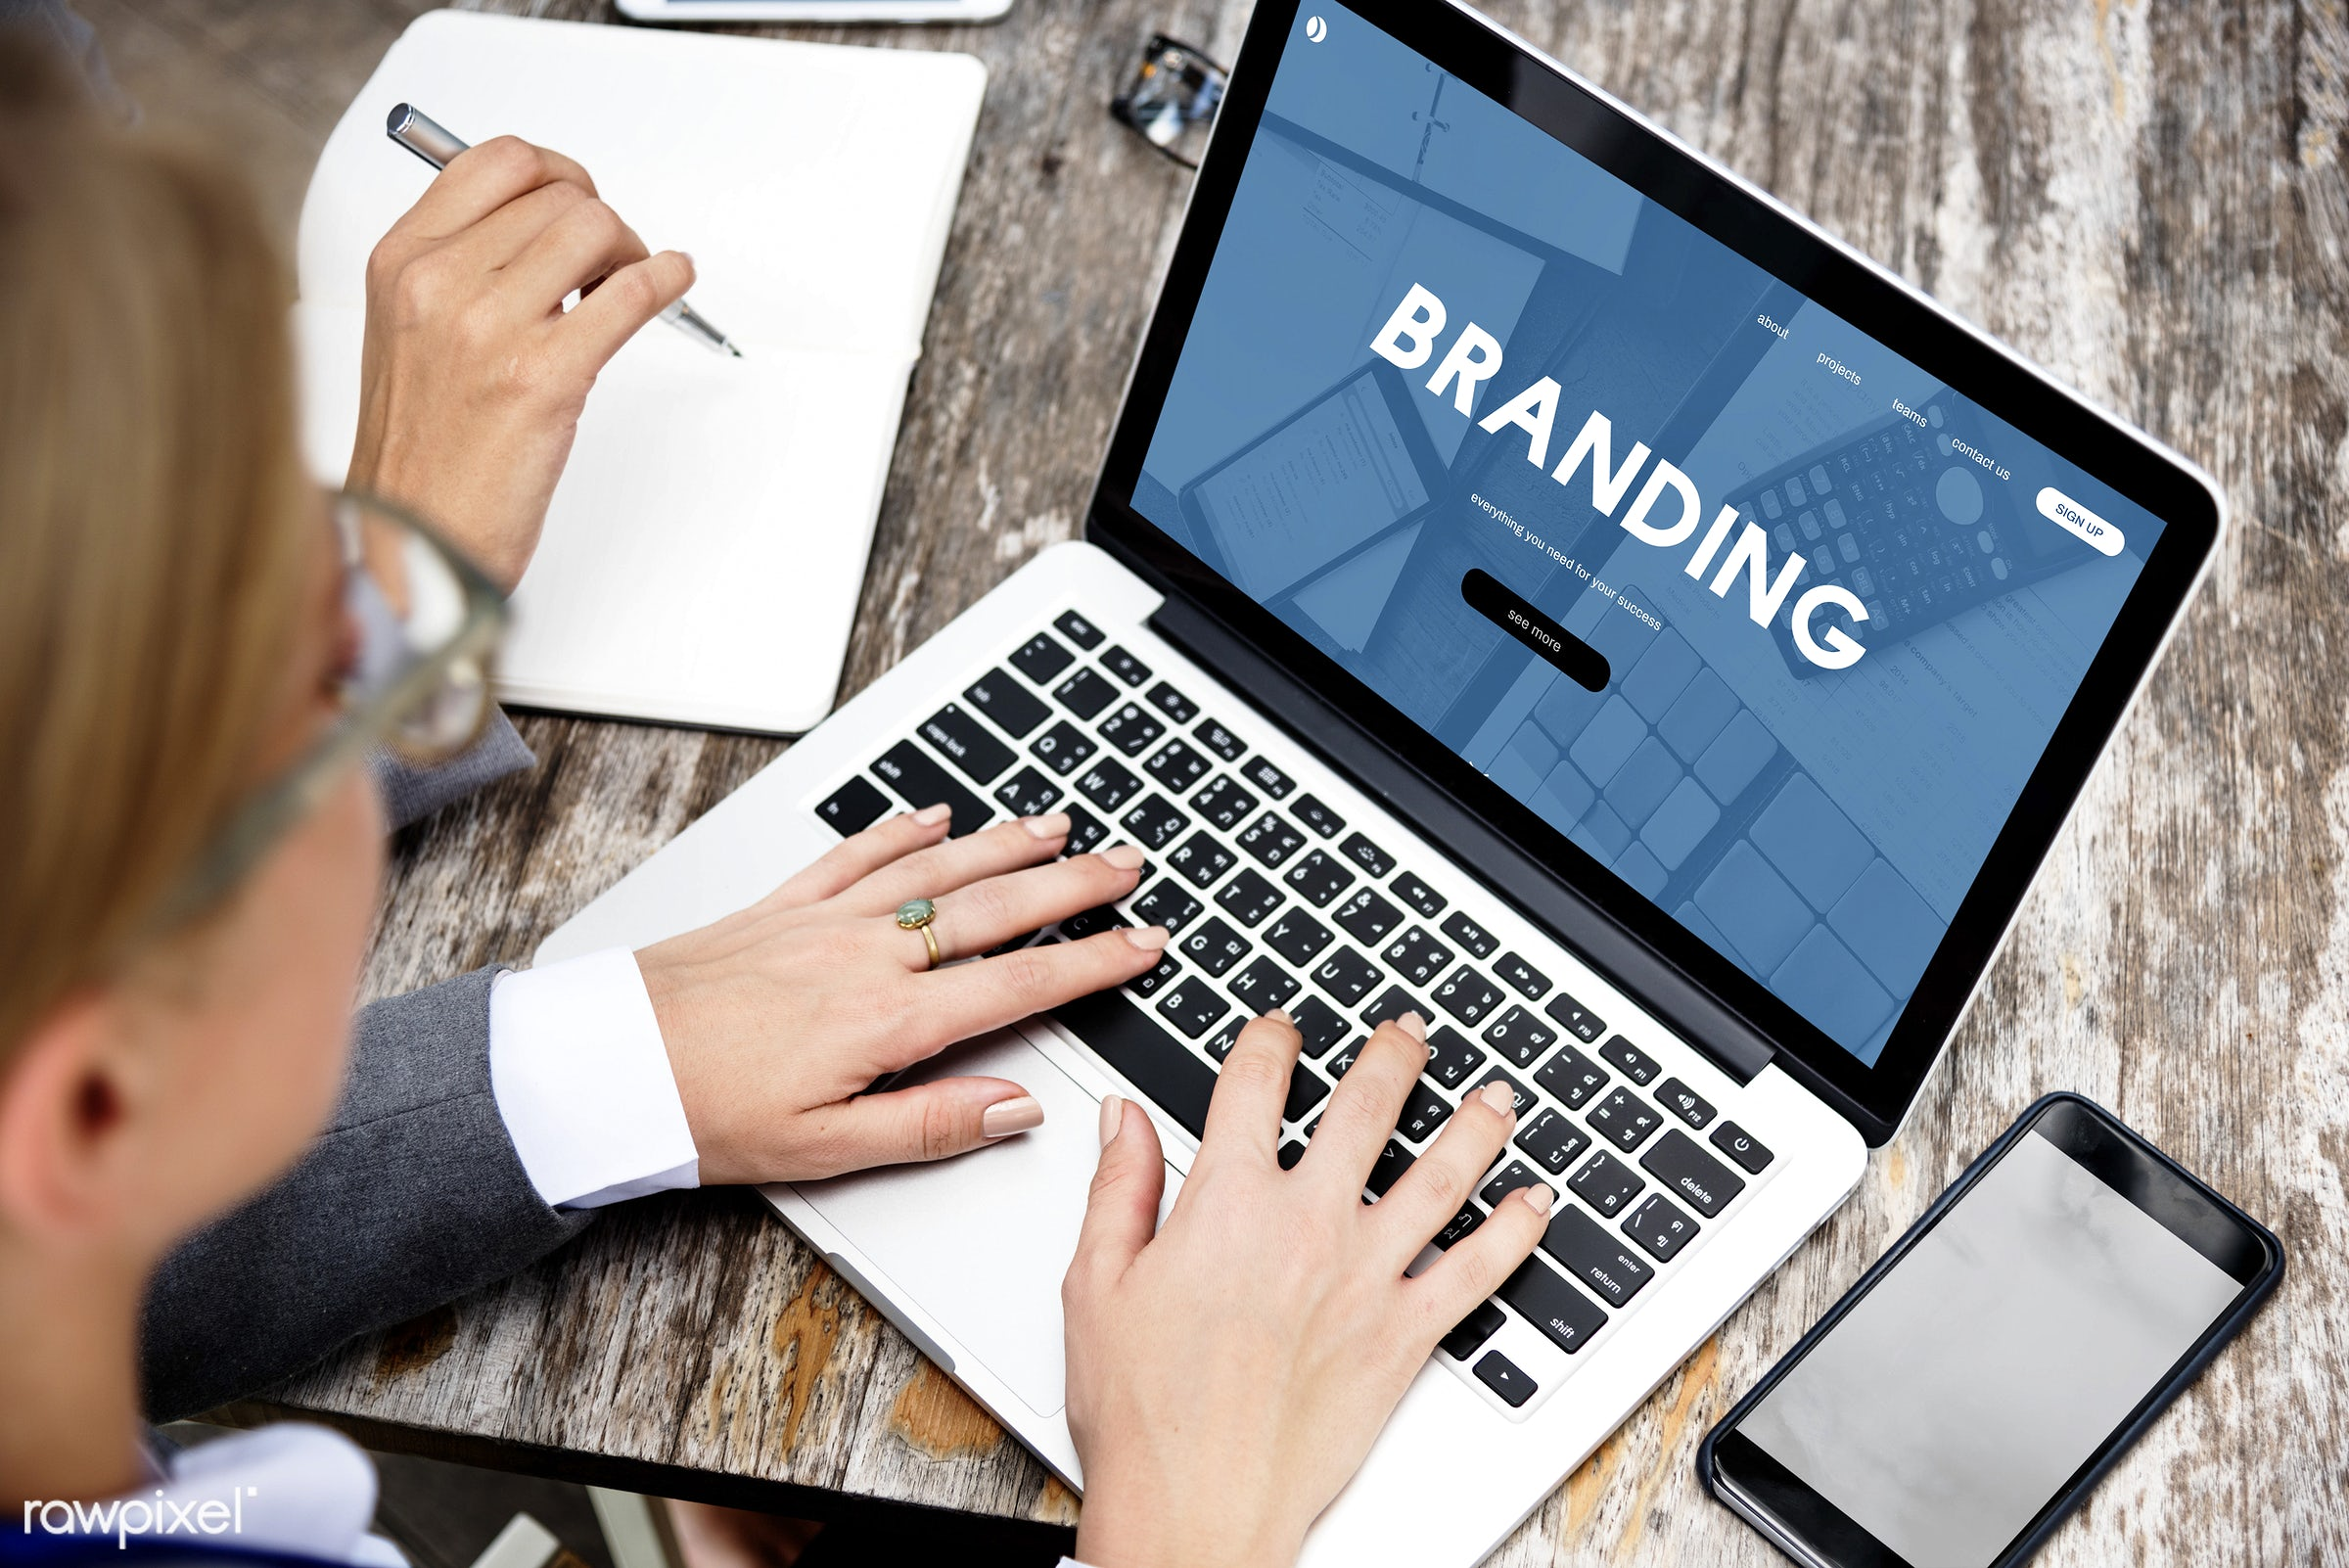 Online business marketing - website, branding, advertising, badge, brand, brand name, business, businesswoman, businesswomen...